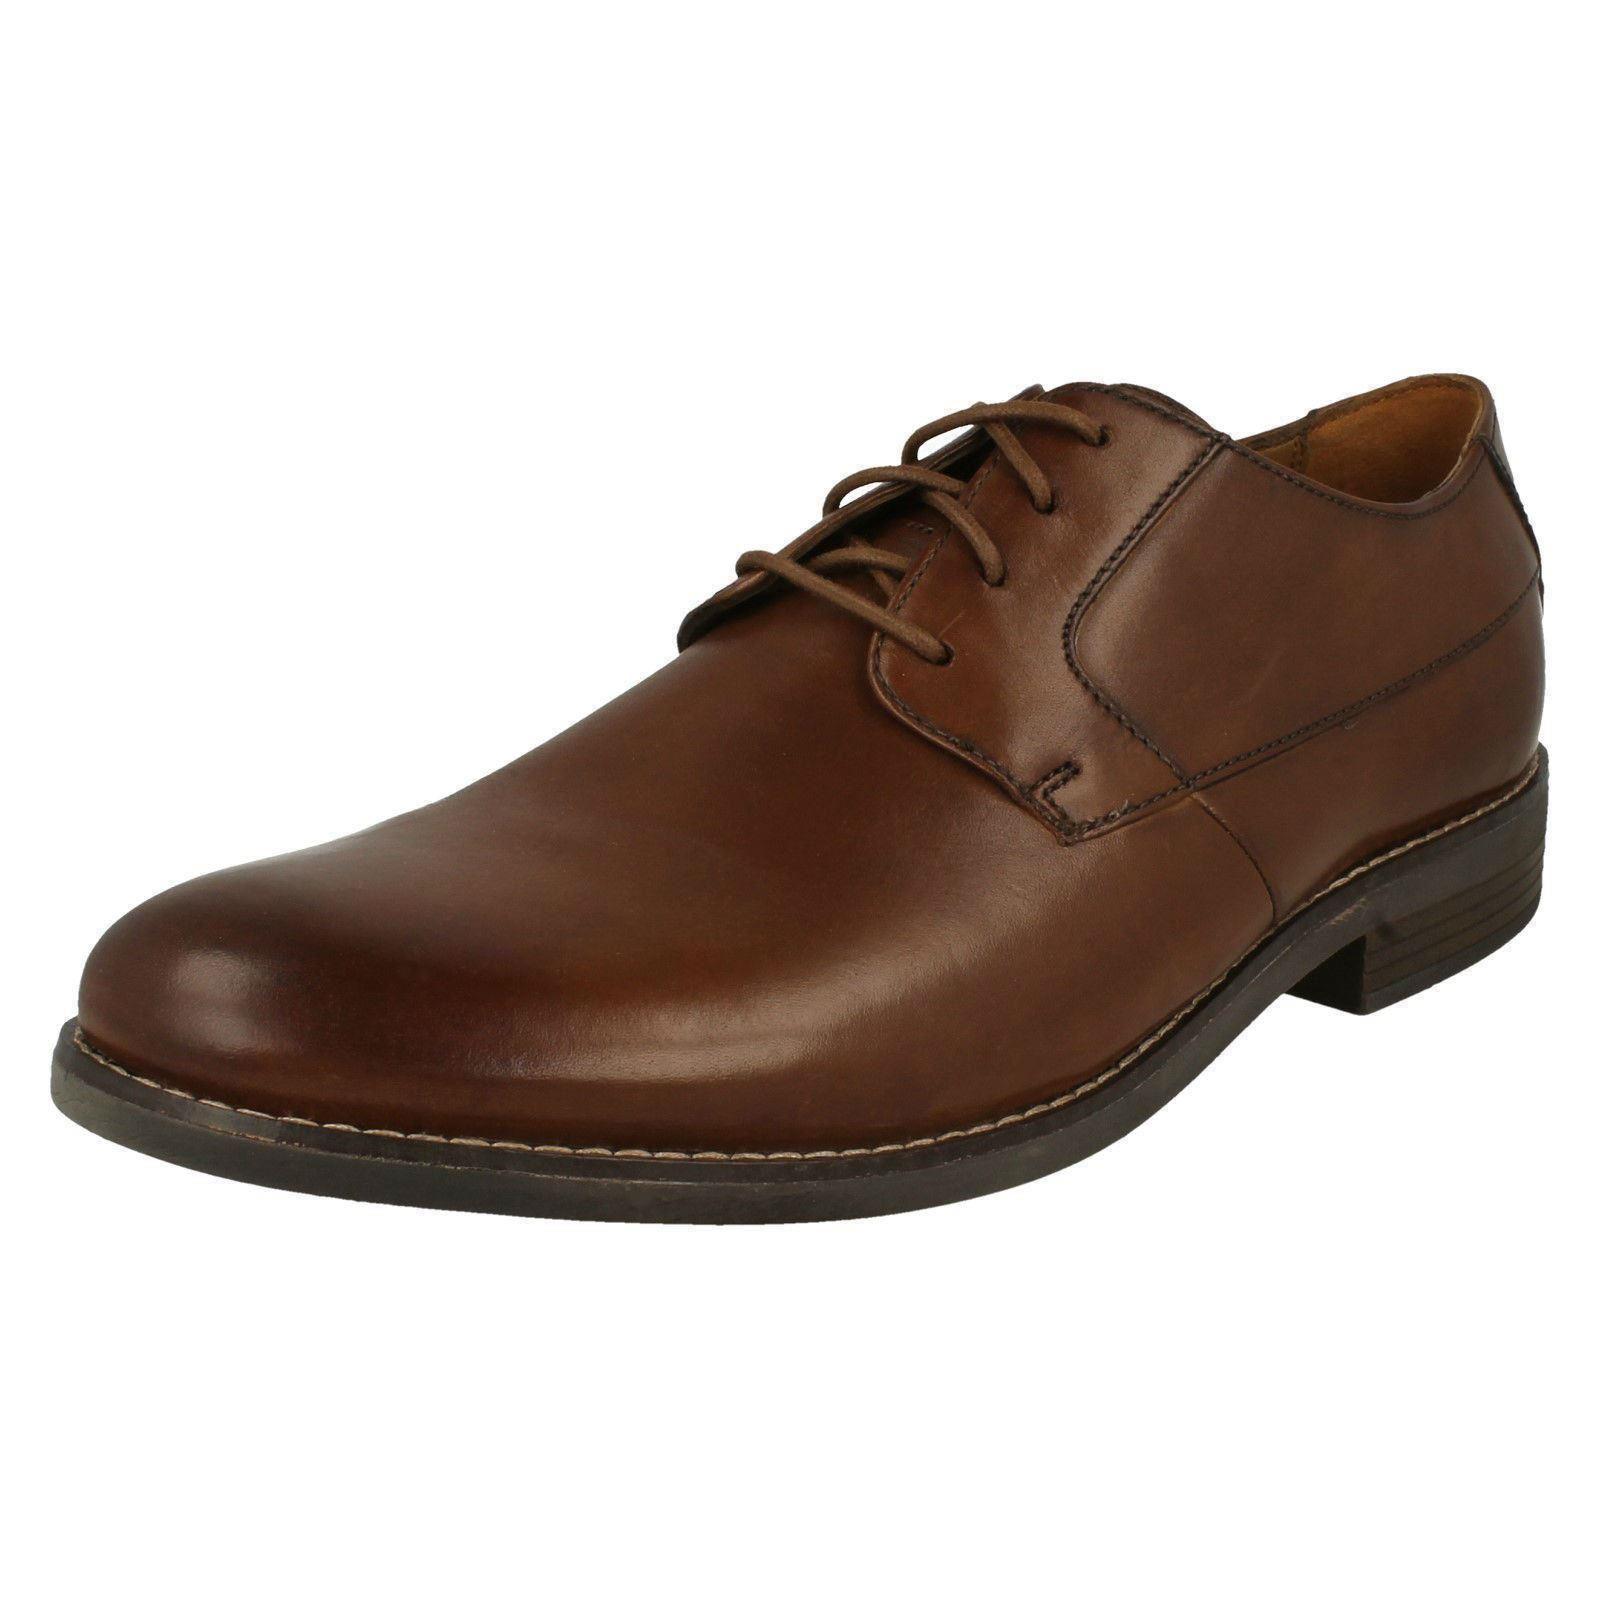 Herren Becken Clarks Becken Herren Plain Smart Schuhes 35f6d6